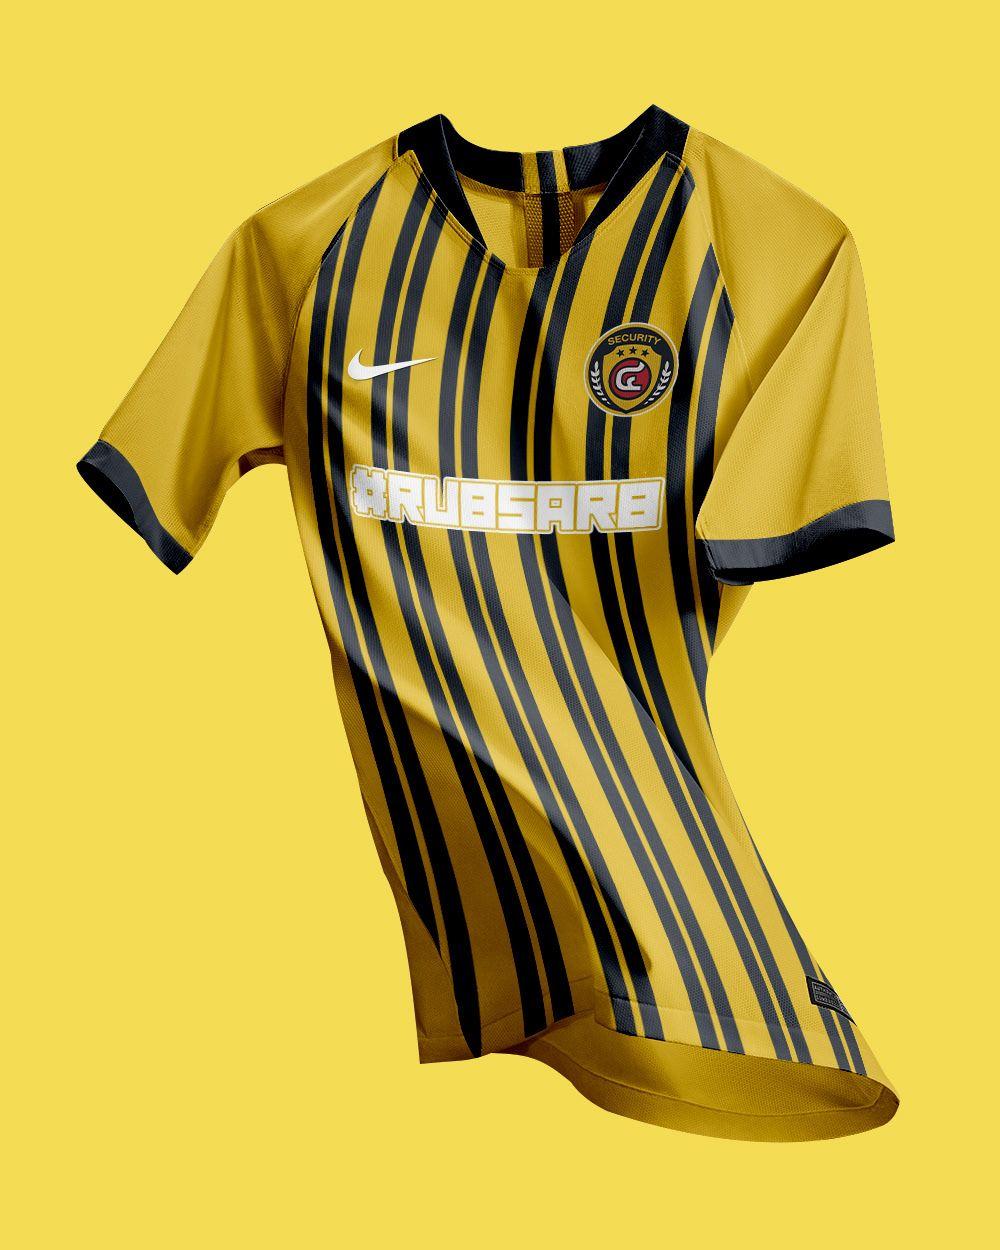 Rubsarb Production Kit Concept On Behance Jersey Design Soccer Uniforms Design Sports Shirts